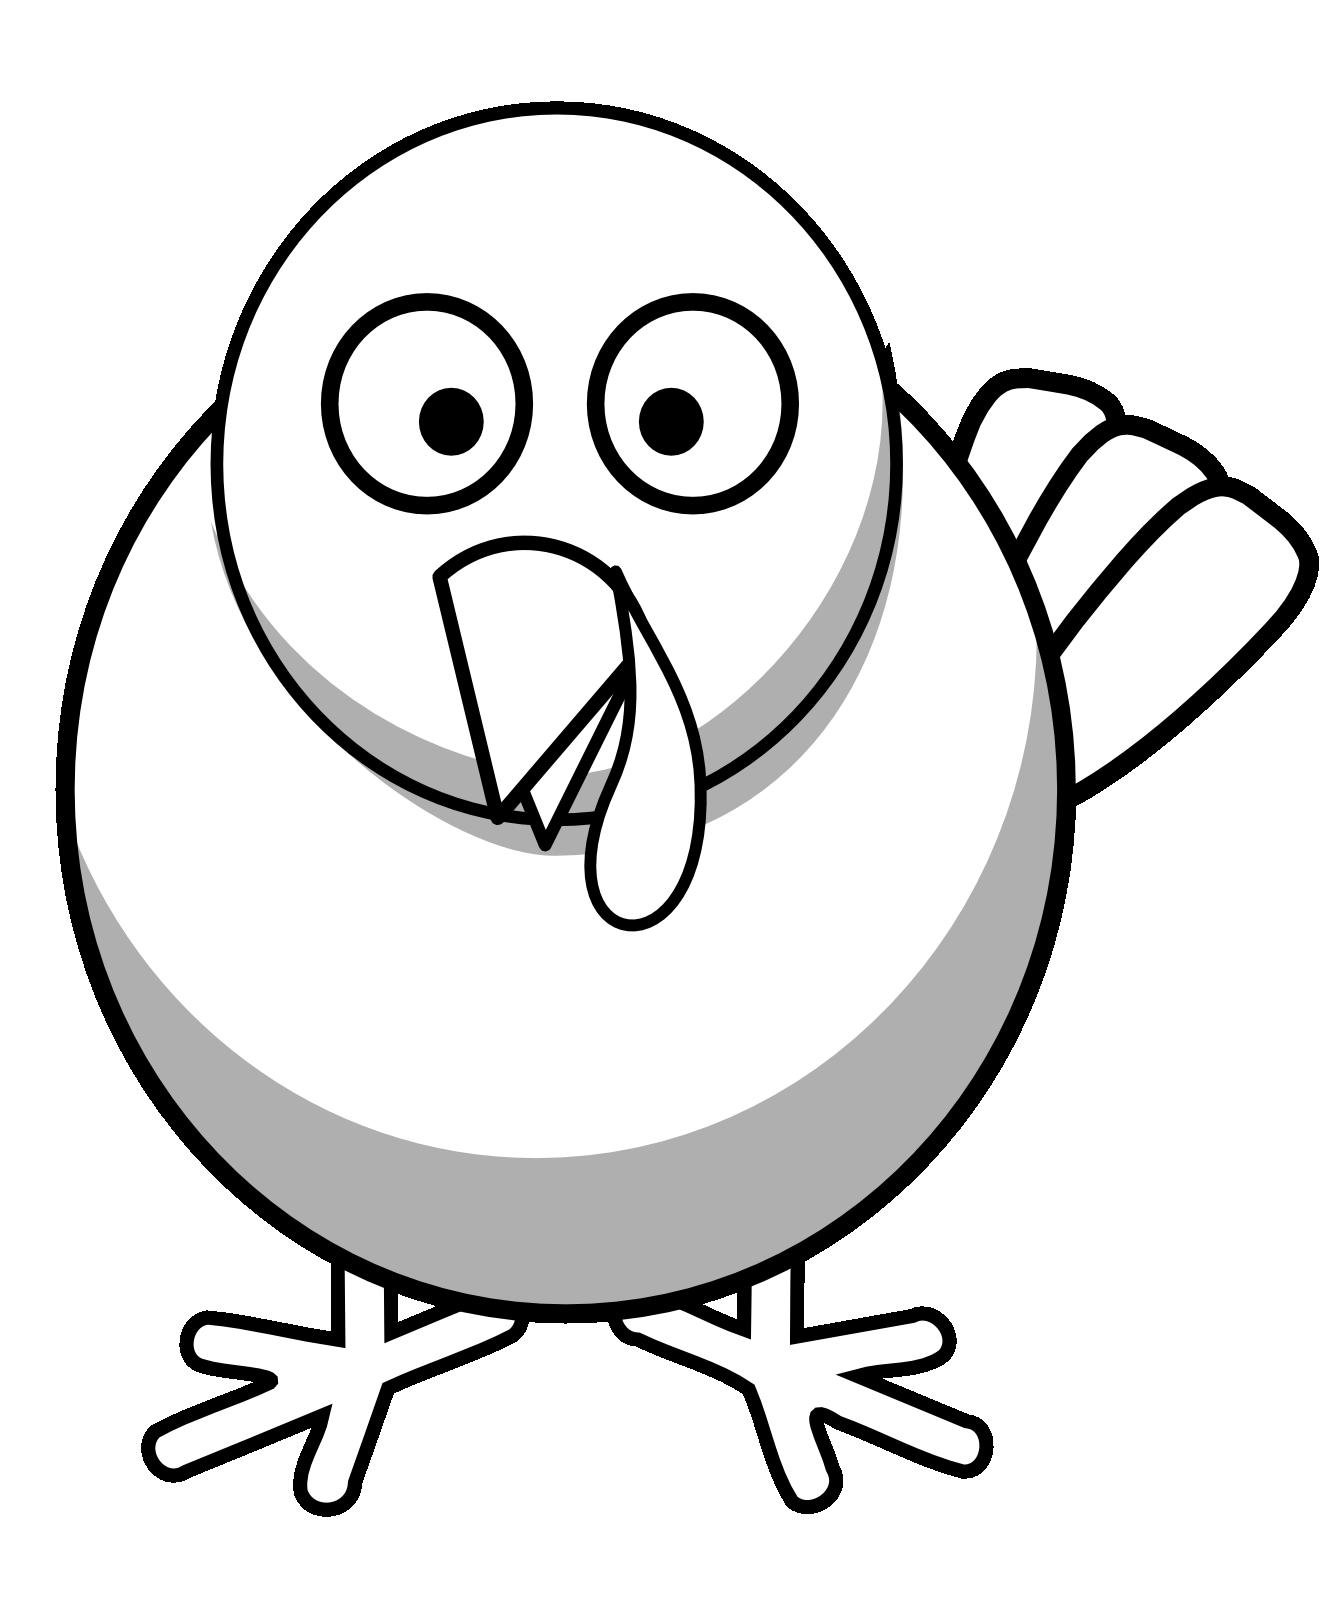 Turkey black and white. Doves clipart blue